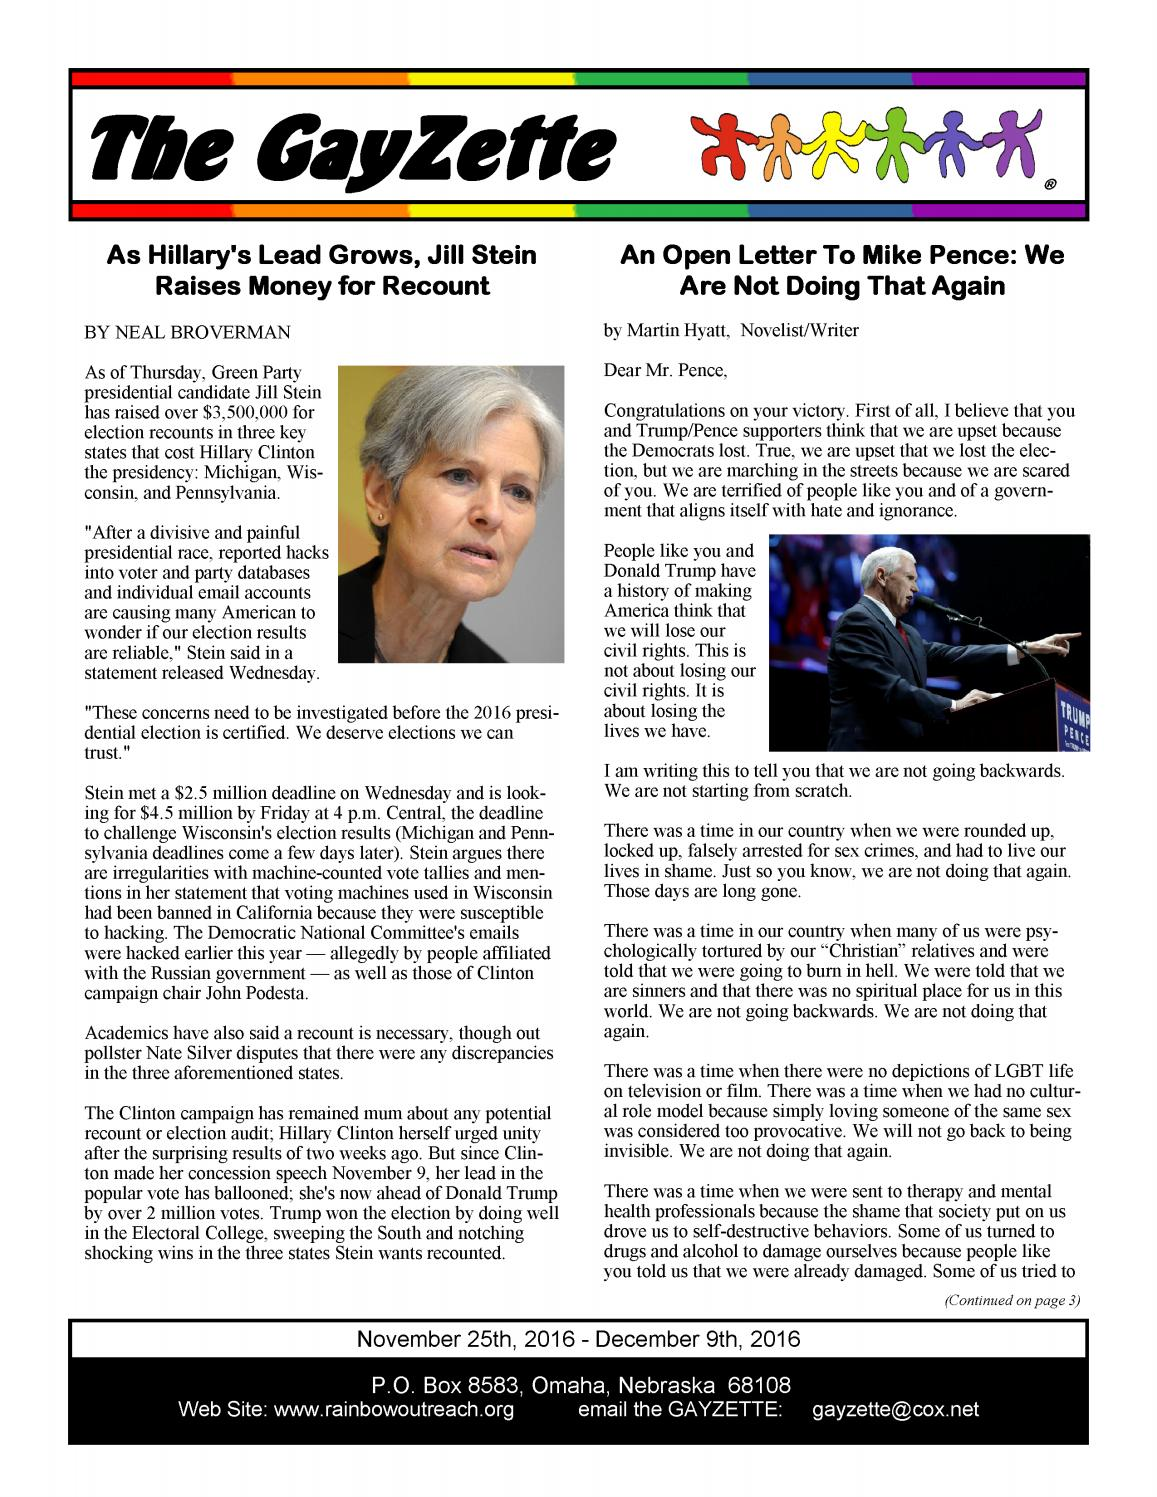 The Gayzette November 25th 2016 Issue By Rainbowoutreach